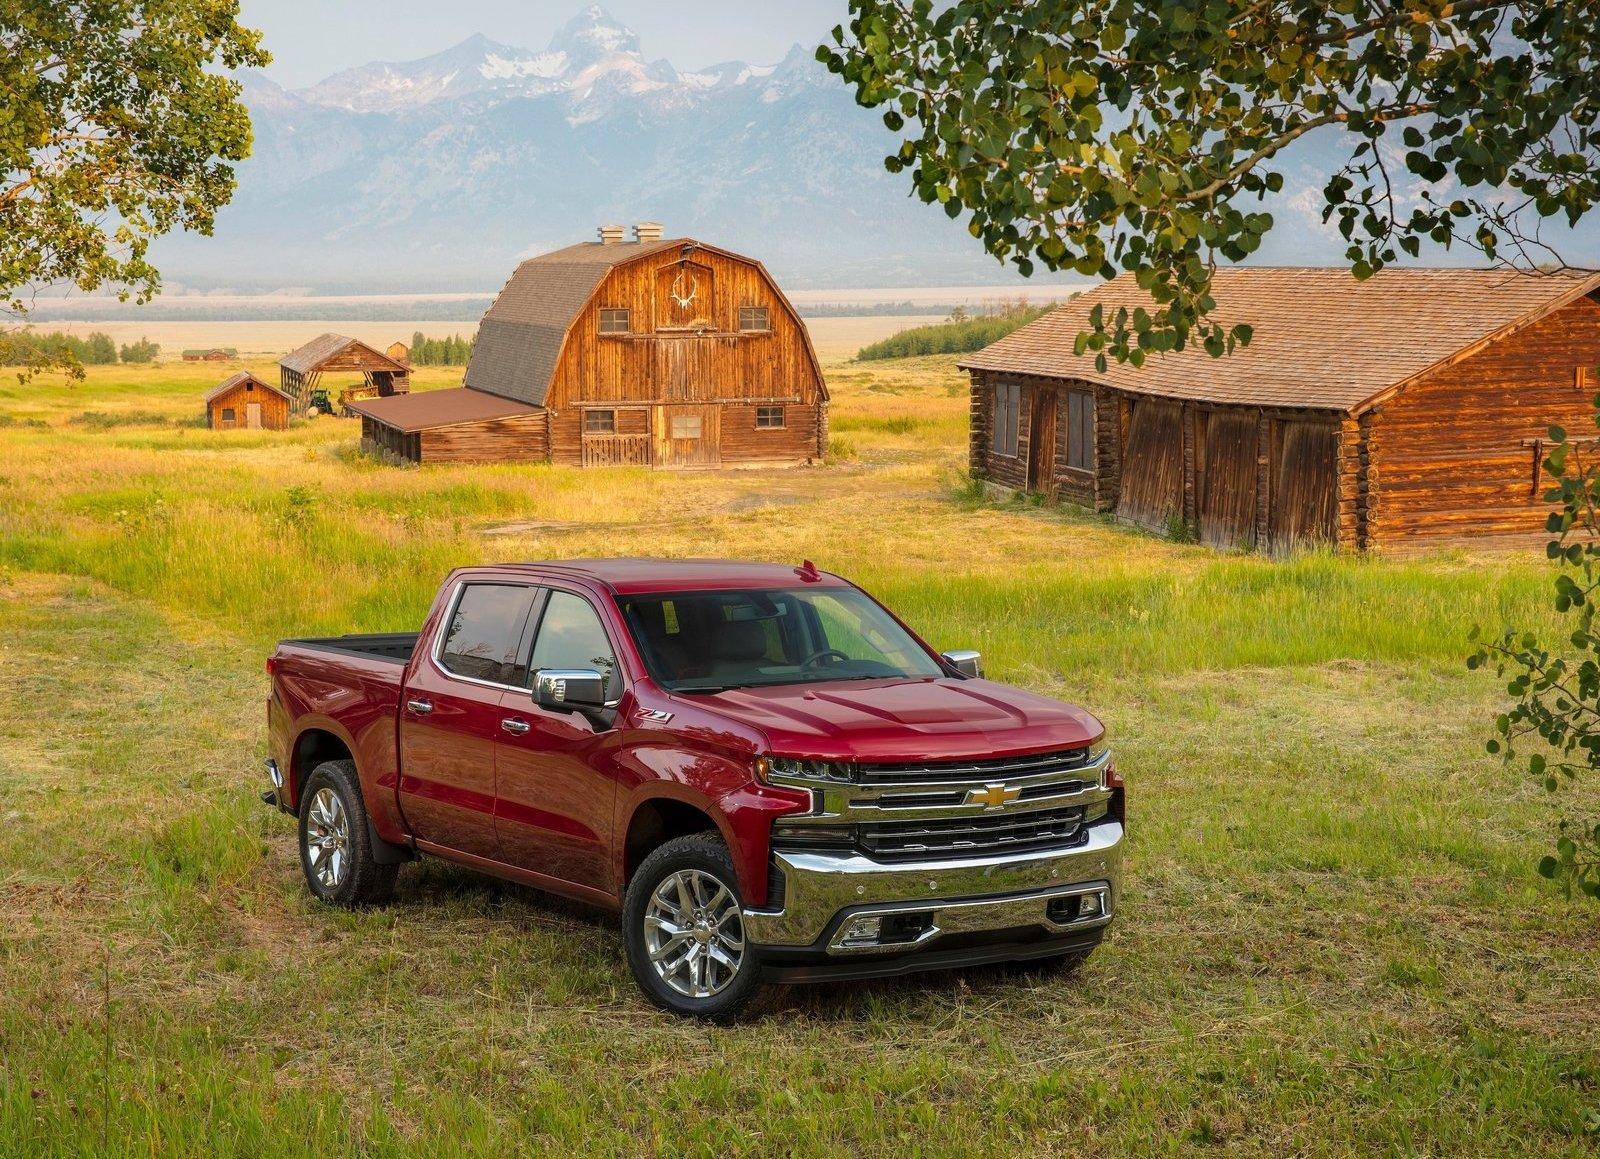 2019 Chevrolet SIlverado red barn